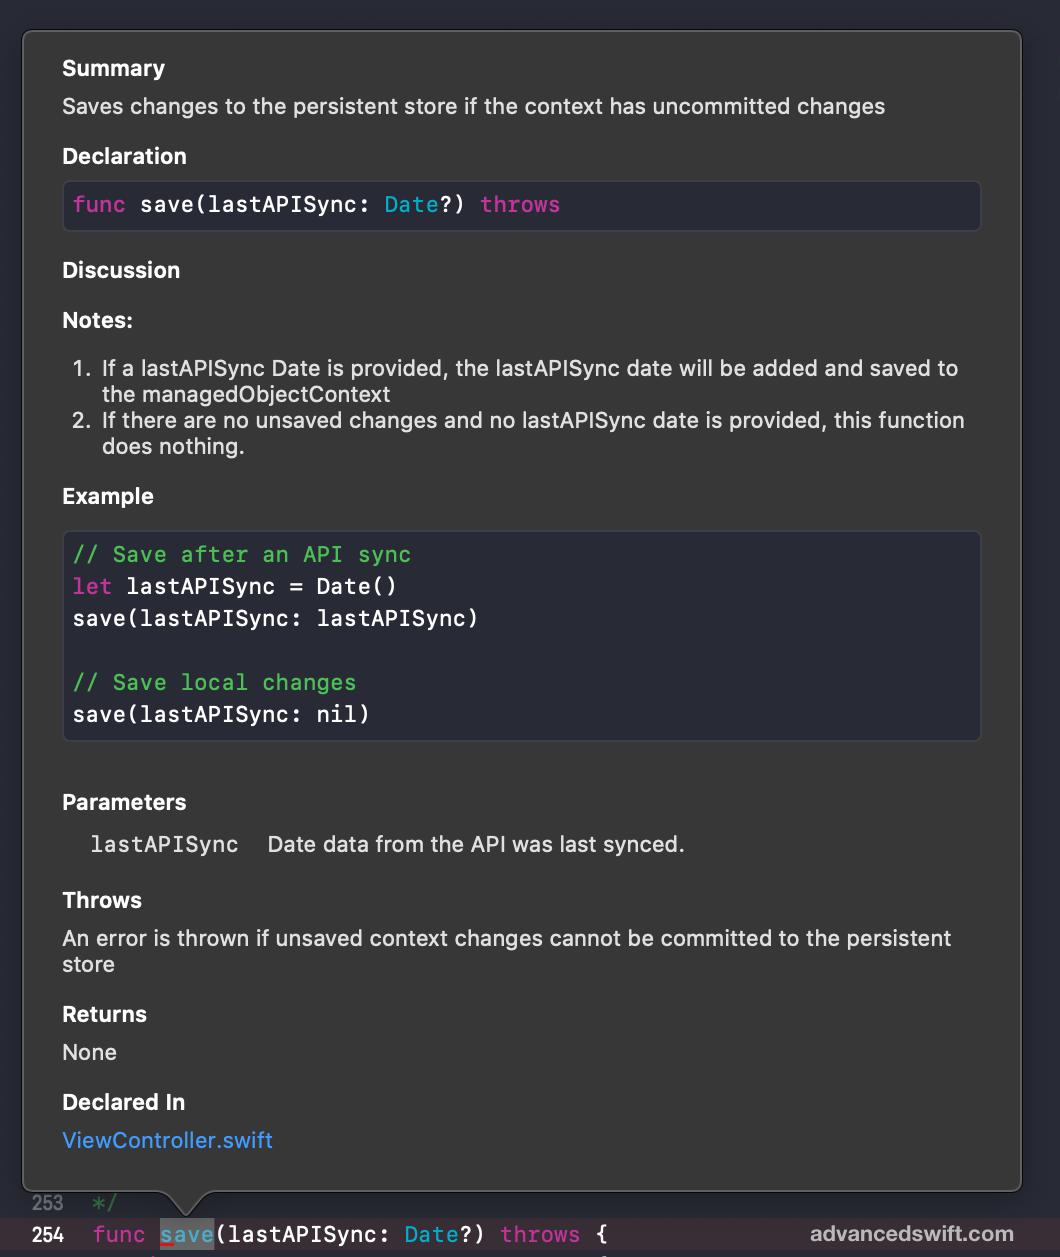 Custom Quick Help Documentation Popup